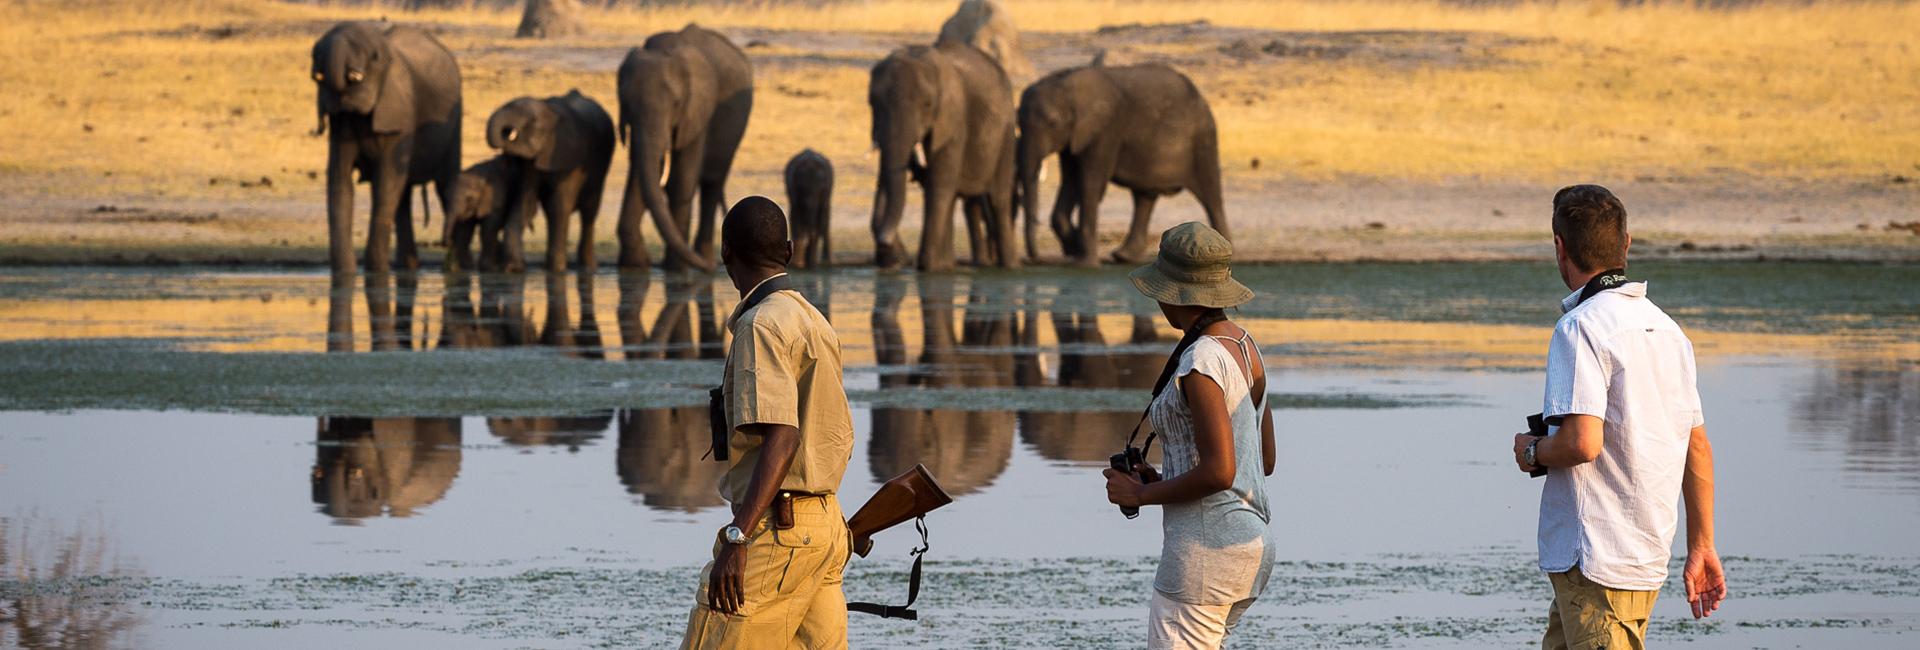 Travel With Purpose Elephants